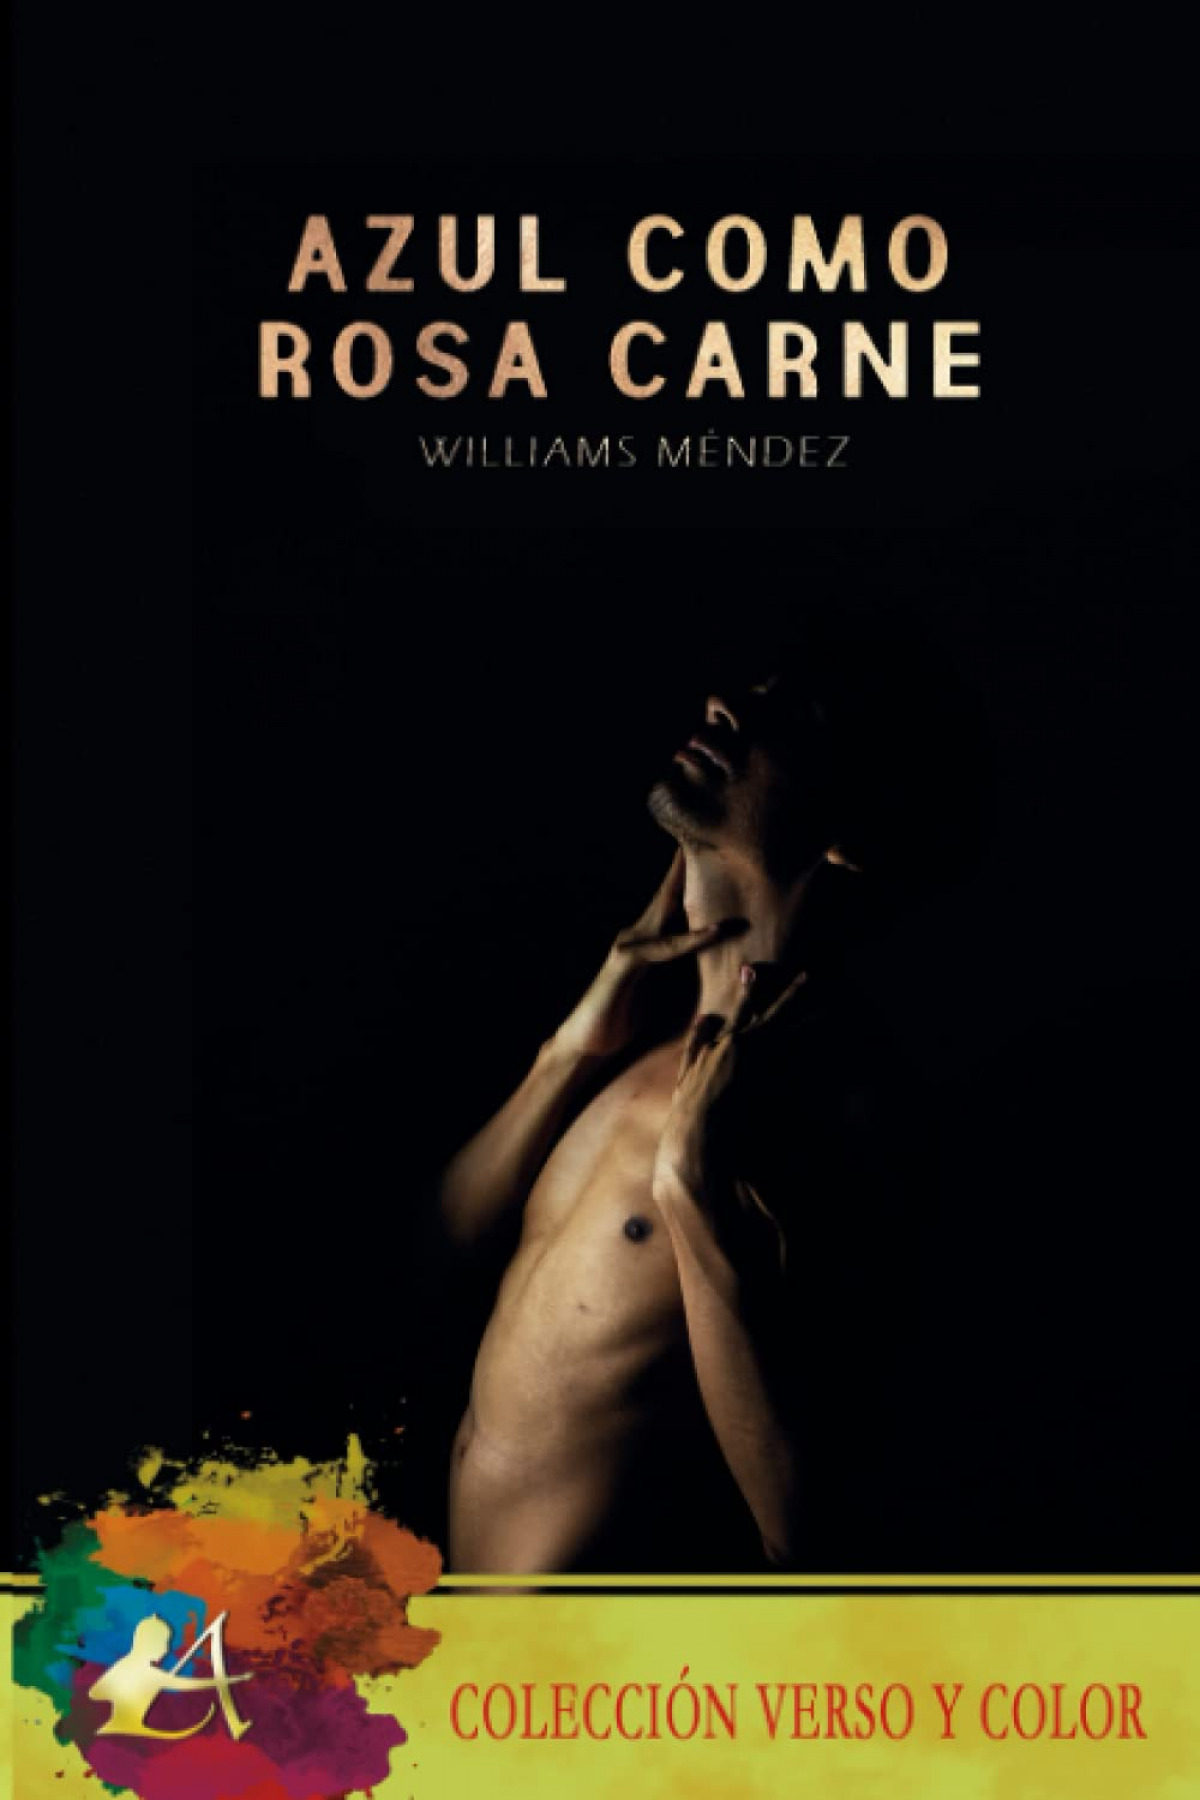 AZUL COMO ROSA CARNE